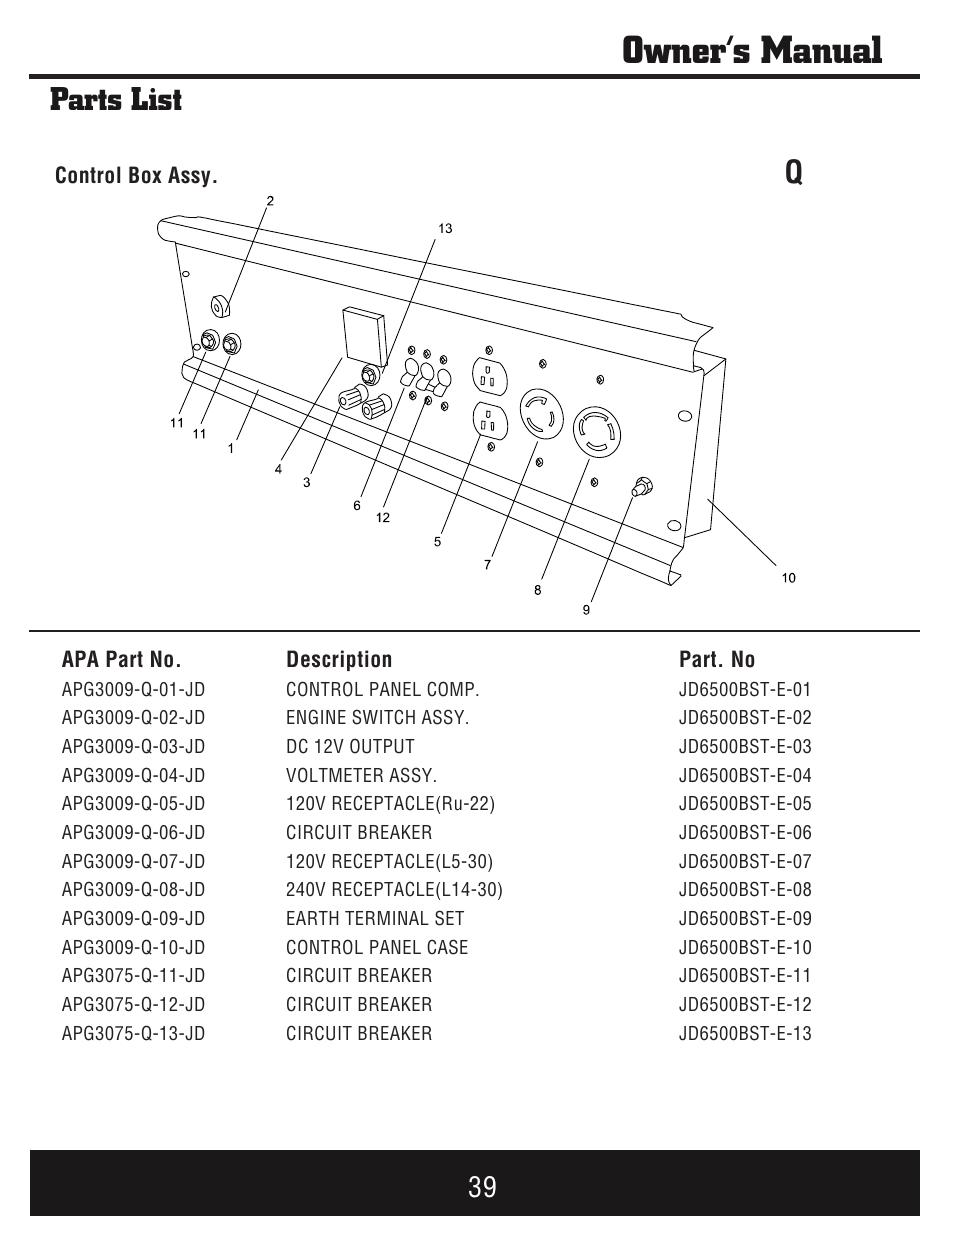 medium resolution of dg6000 wiring diagram